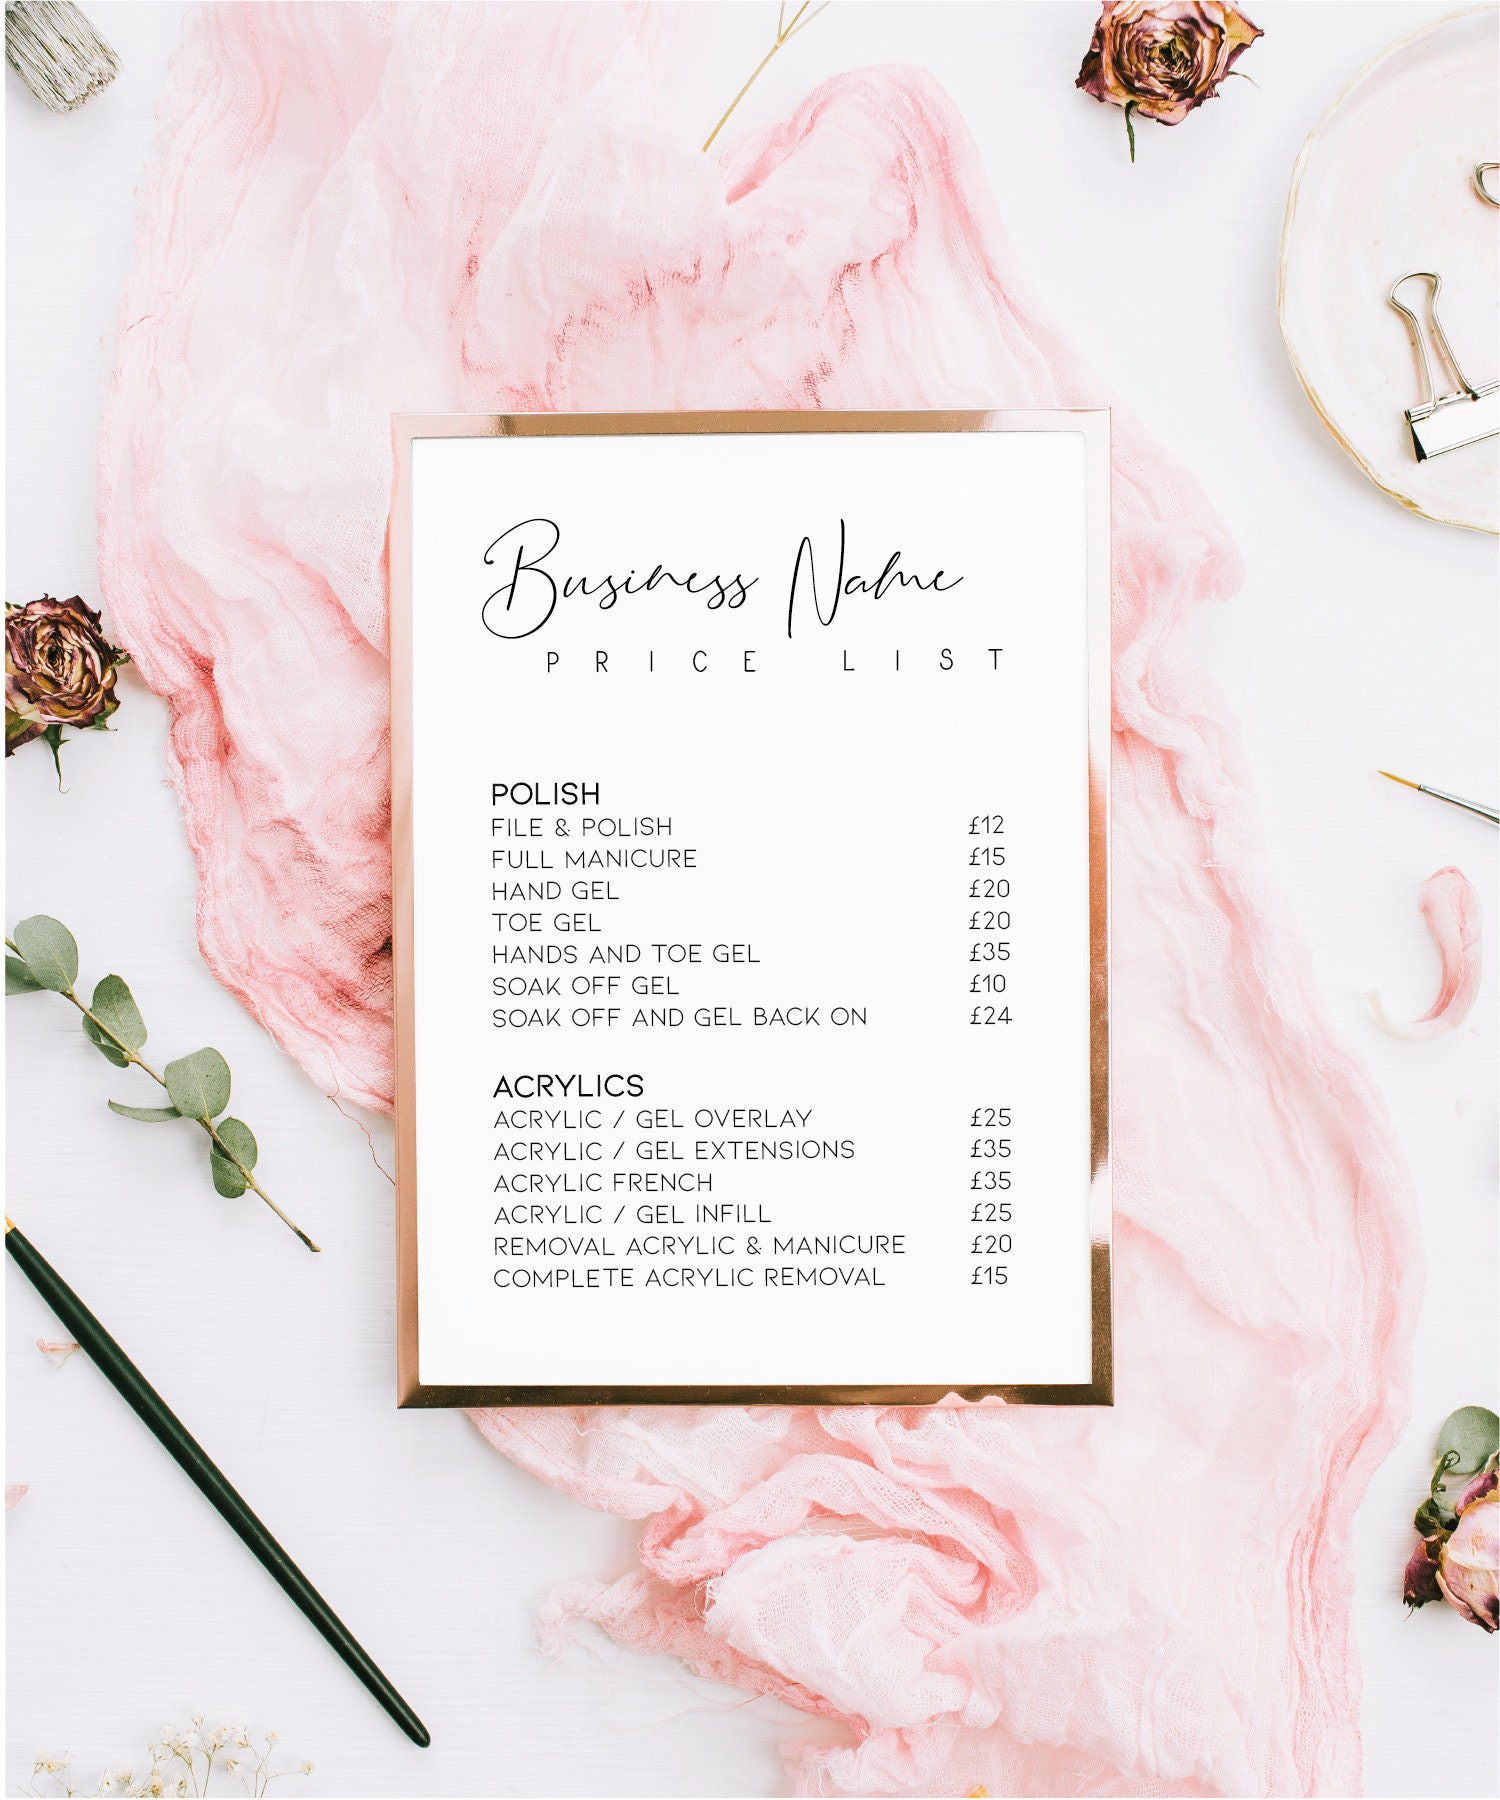 Printed Price List, Beauty Salon Print